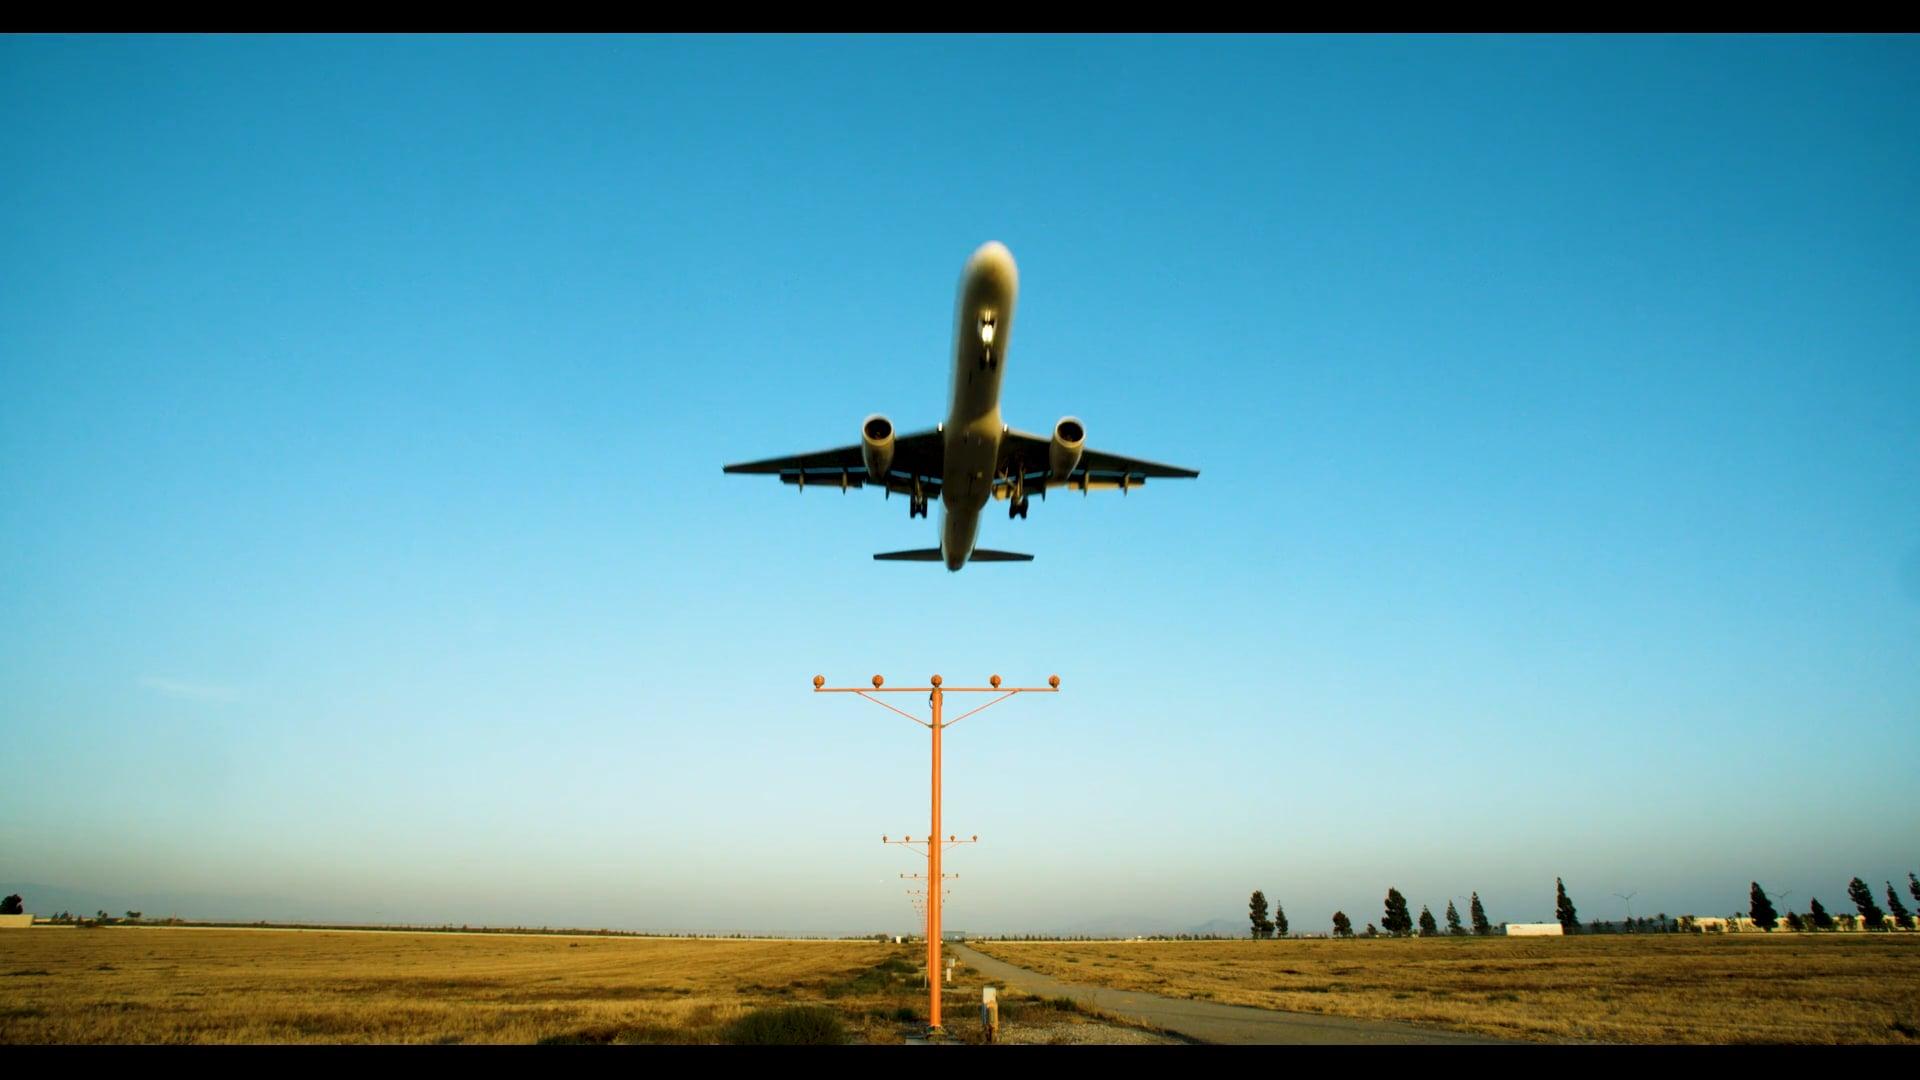 Ontario International Airport (Eric Jackson)